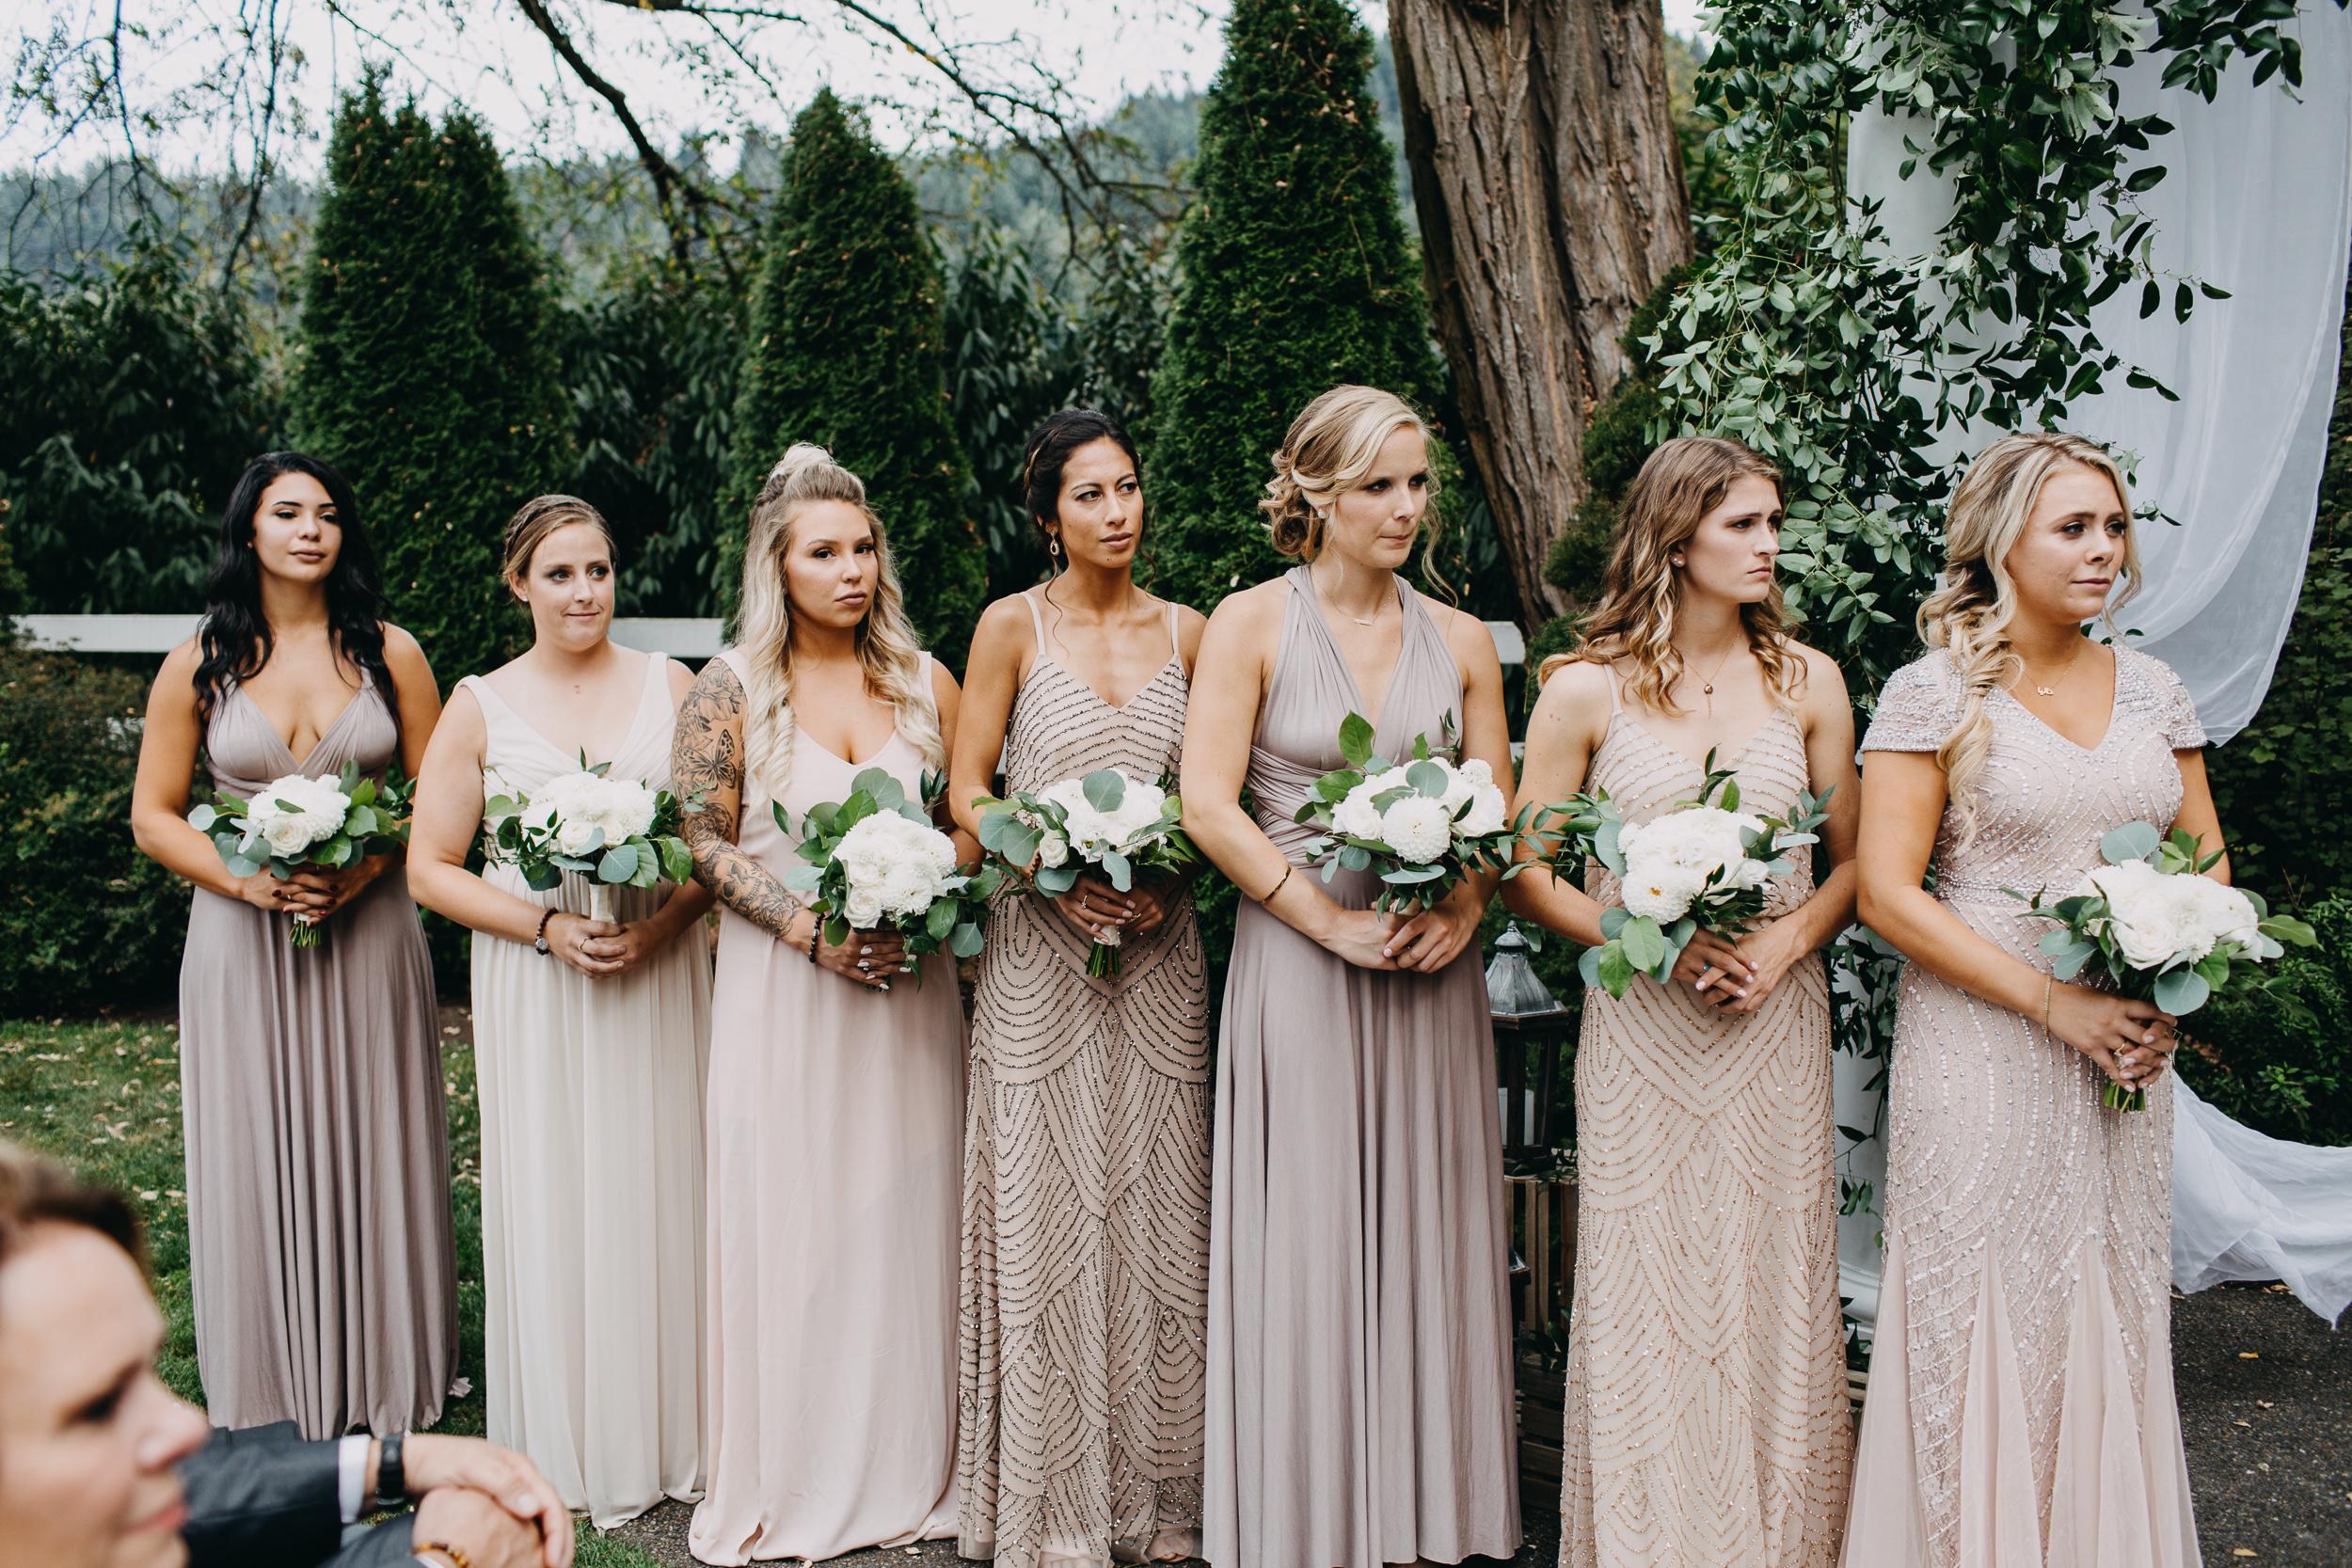 20170820 Savanna & Vince Wedding 1202.jpg